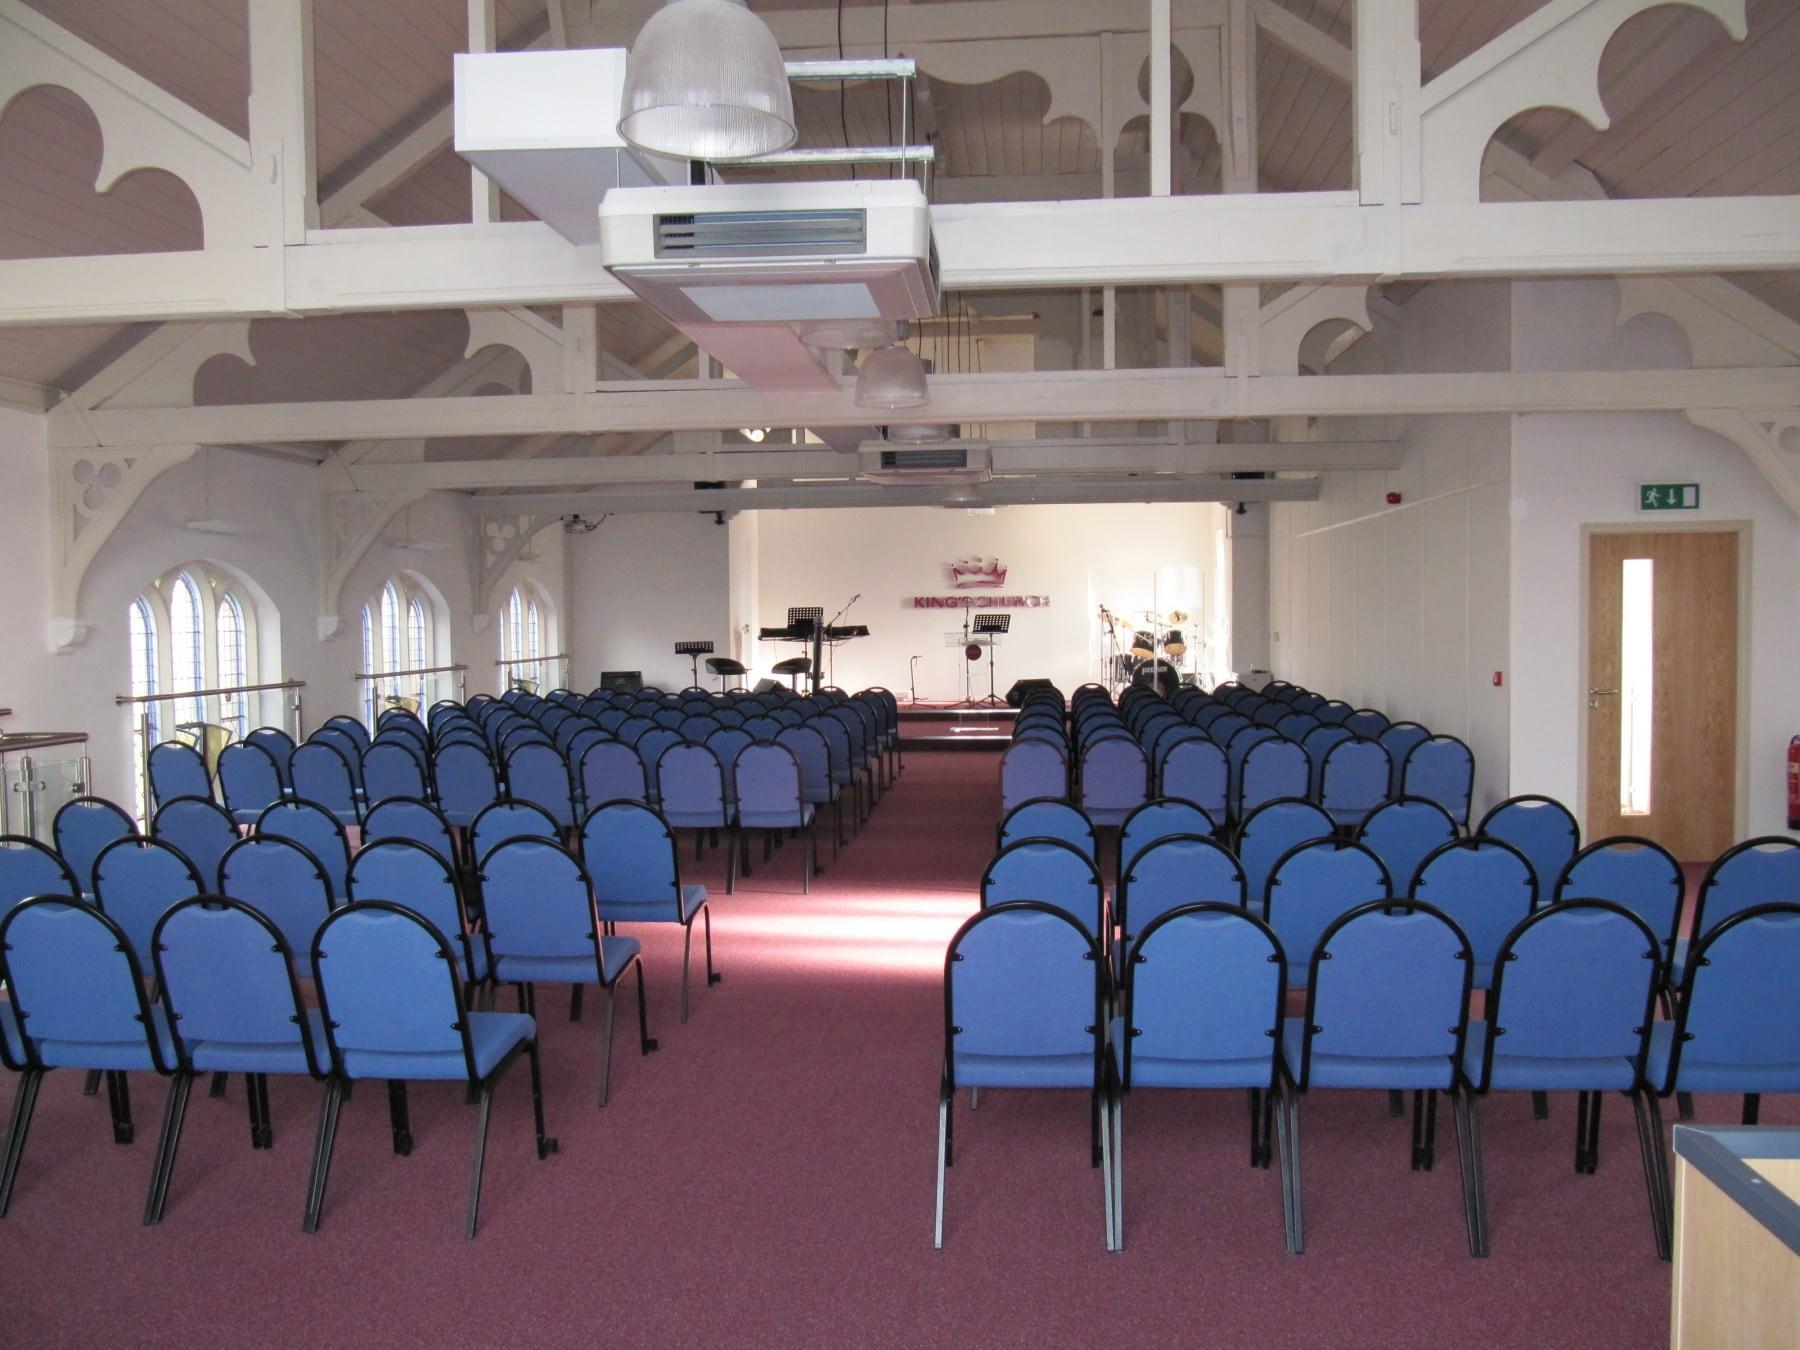 Kings Church Cambridge Interior Image